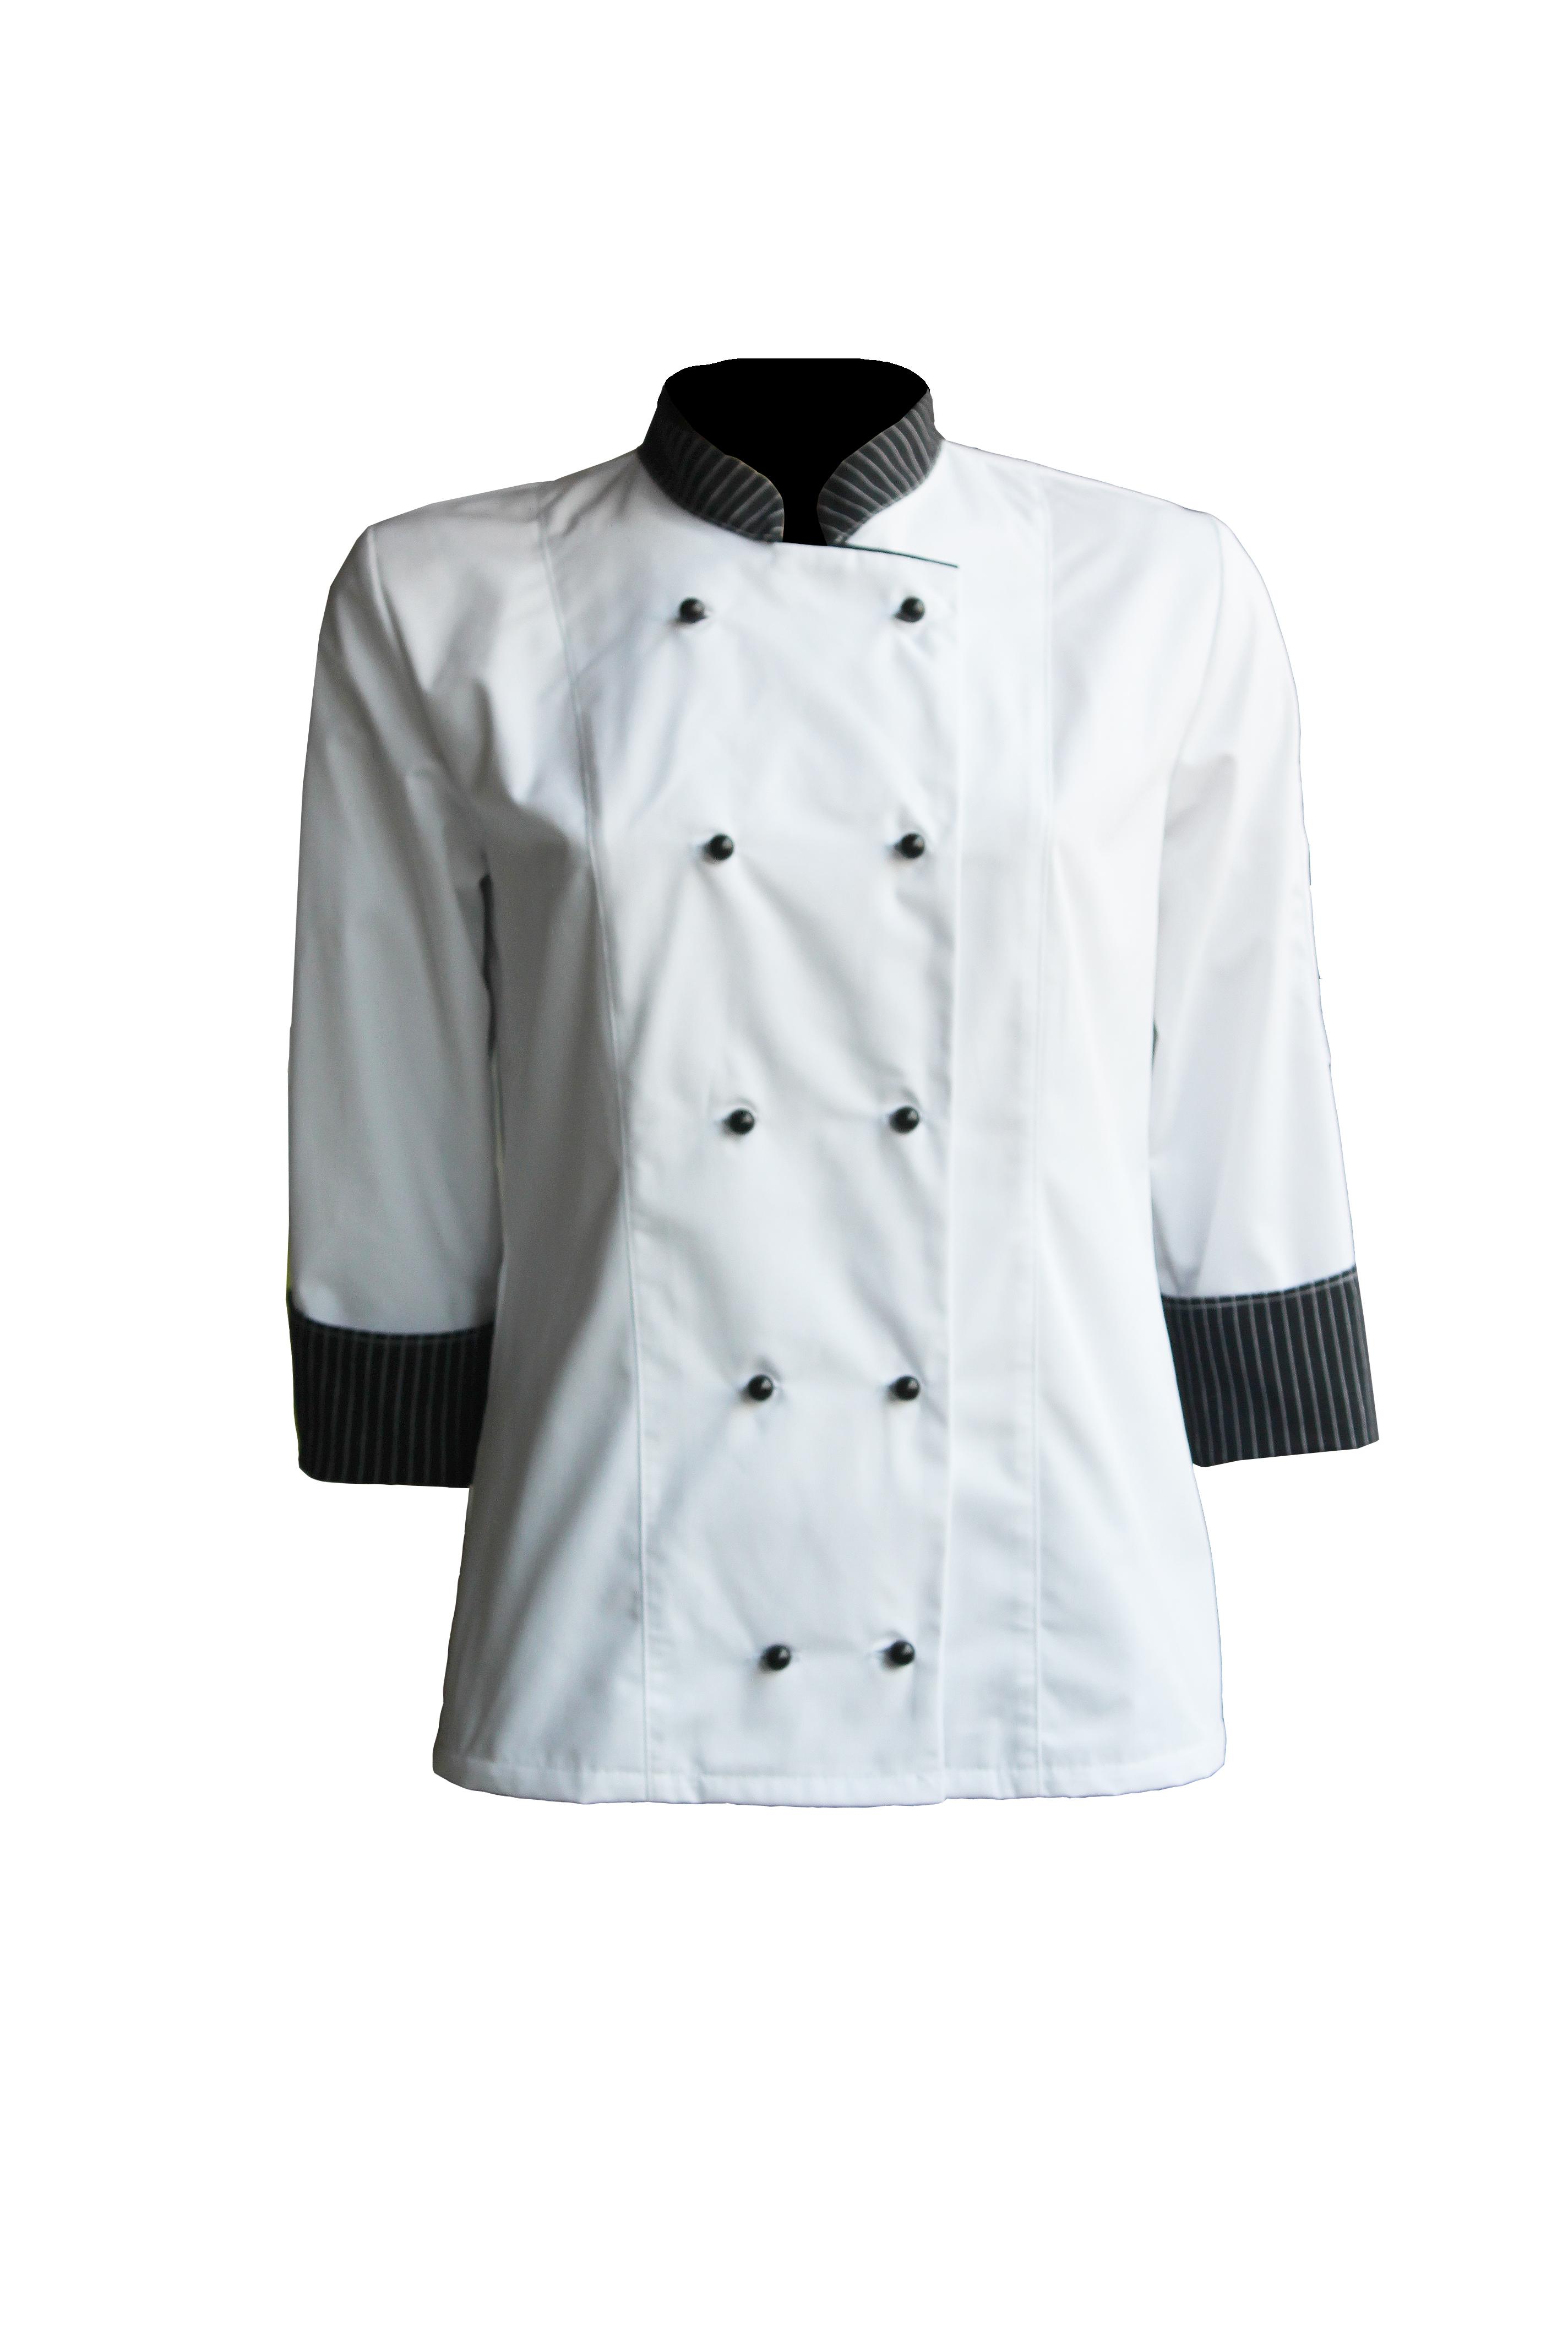 Kuharska bluza ženska ADRIATIC bijela